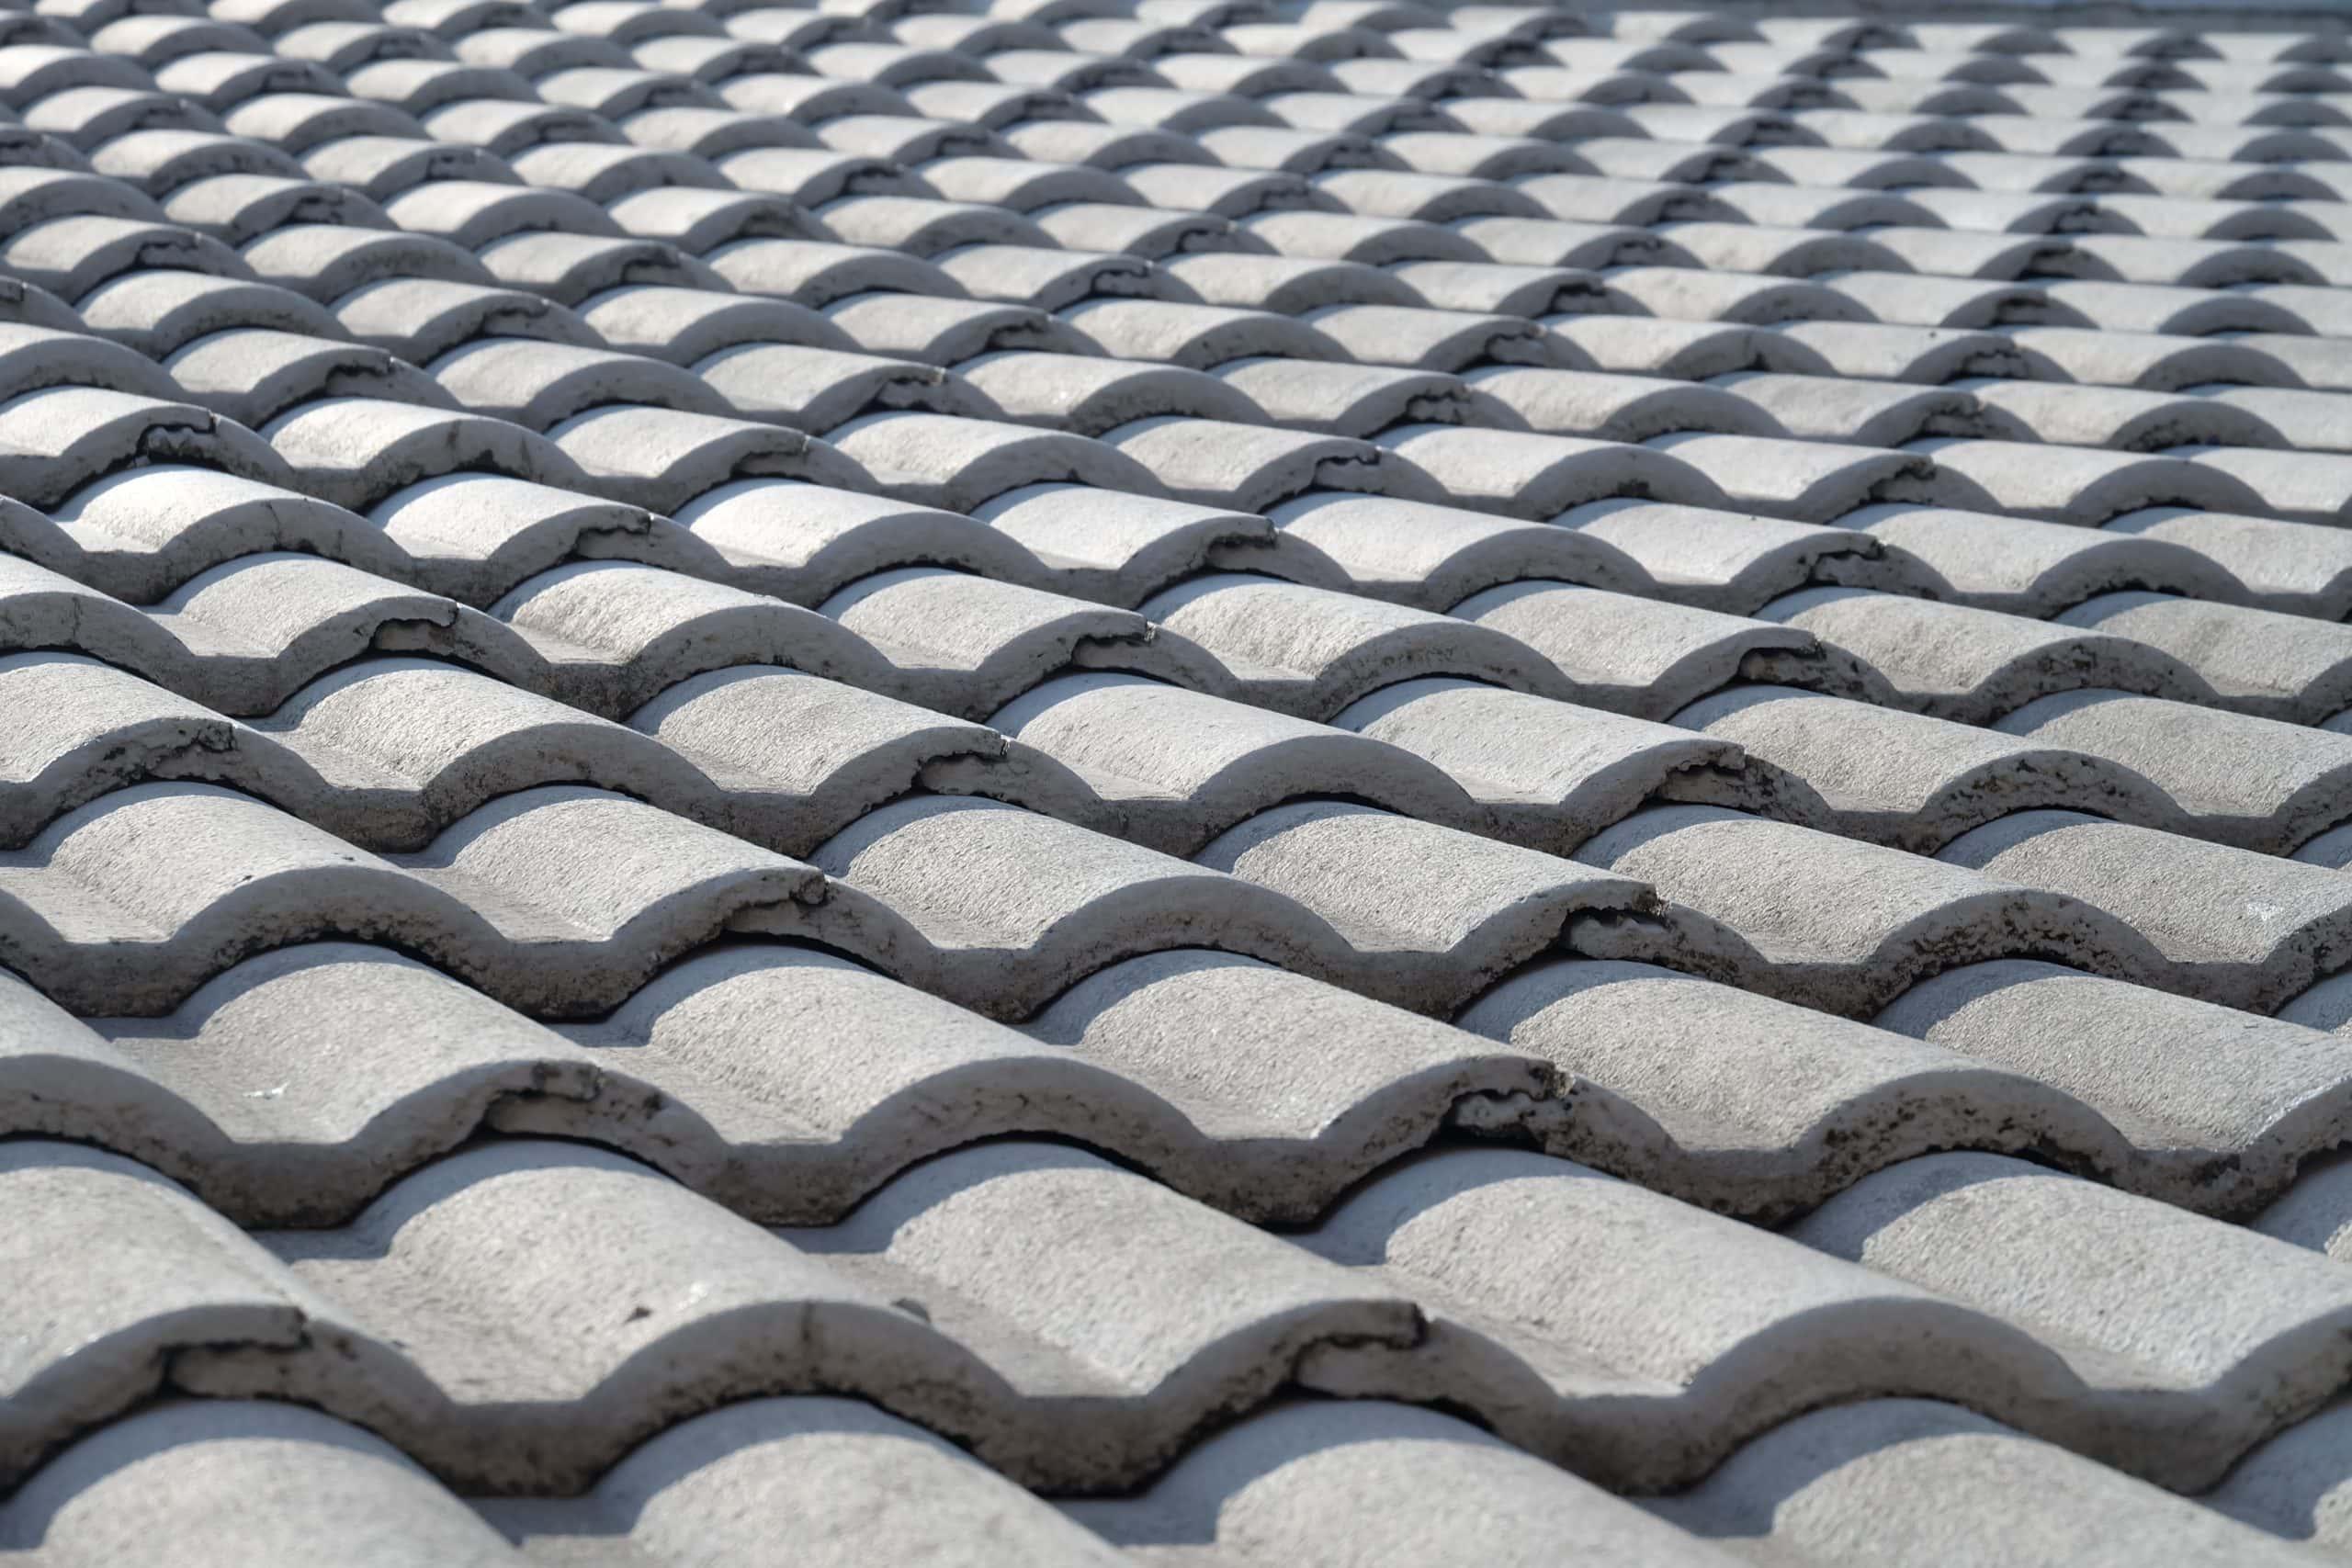 How Long Does Concrete Tile Roofing Last?